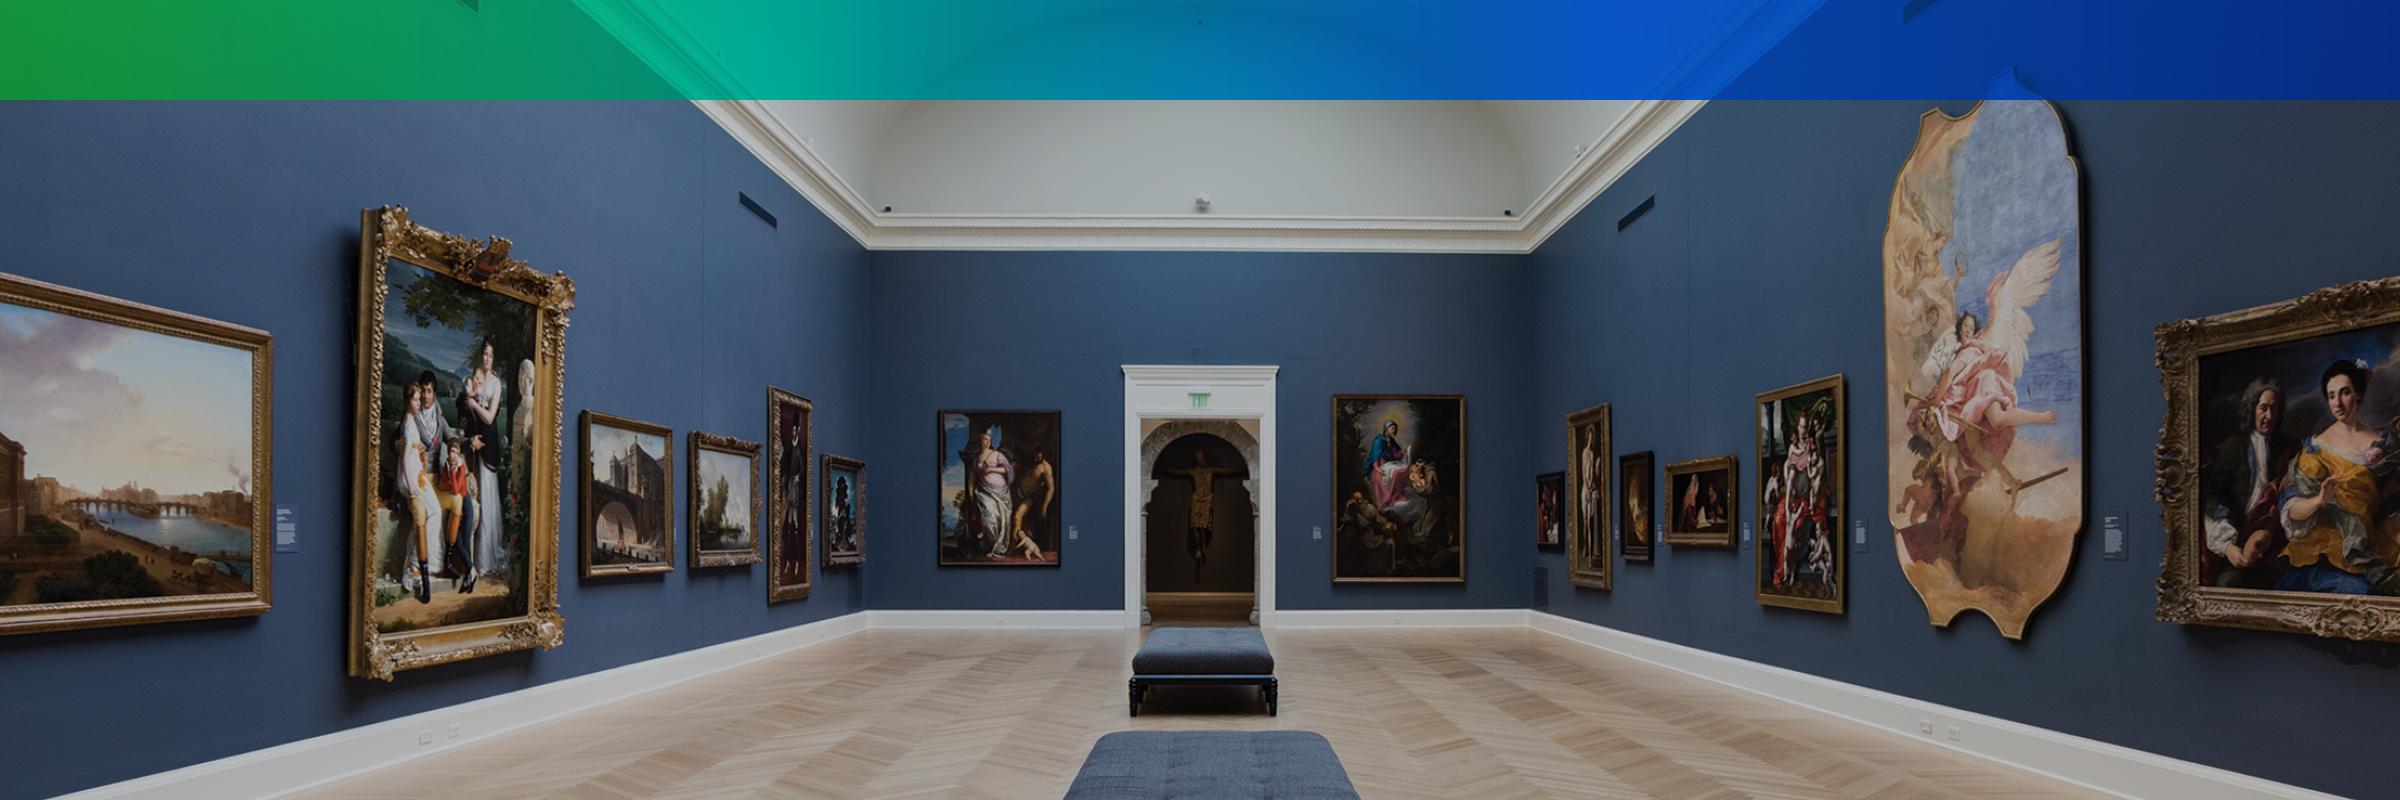 Museum & Gallery -